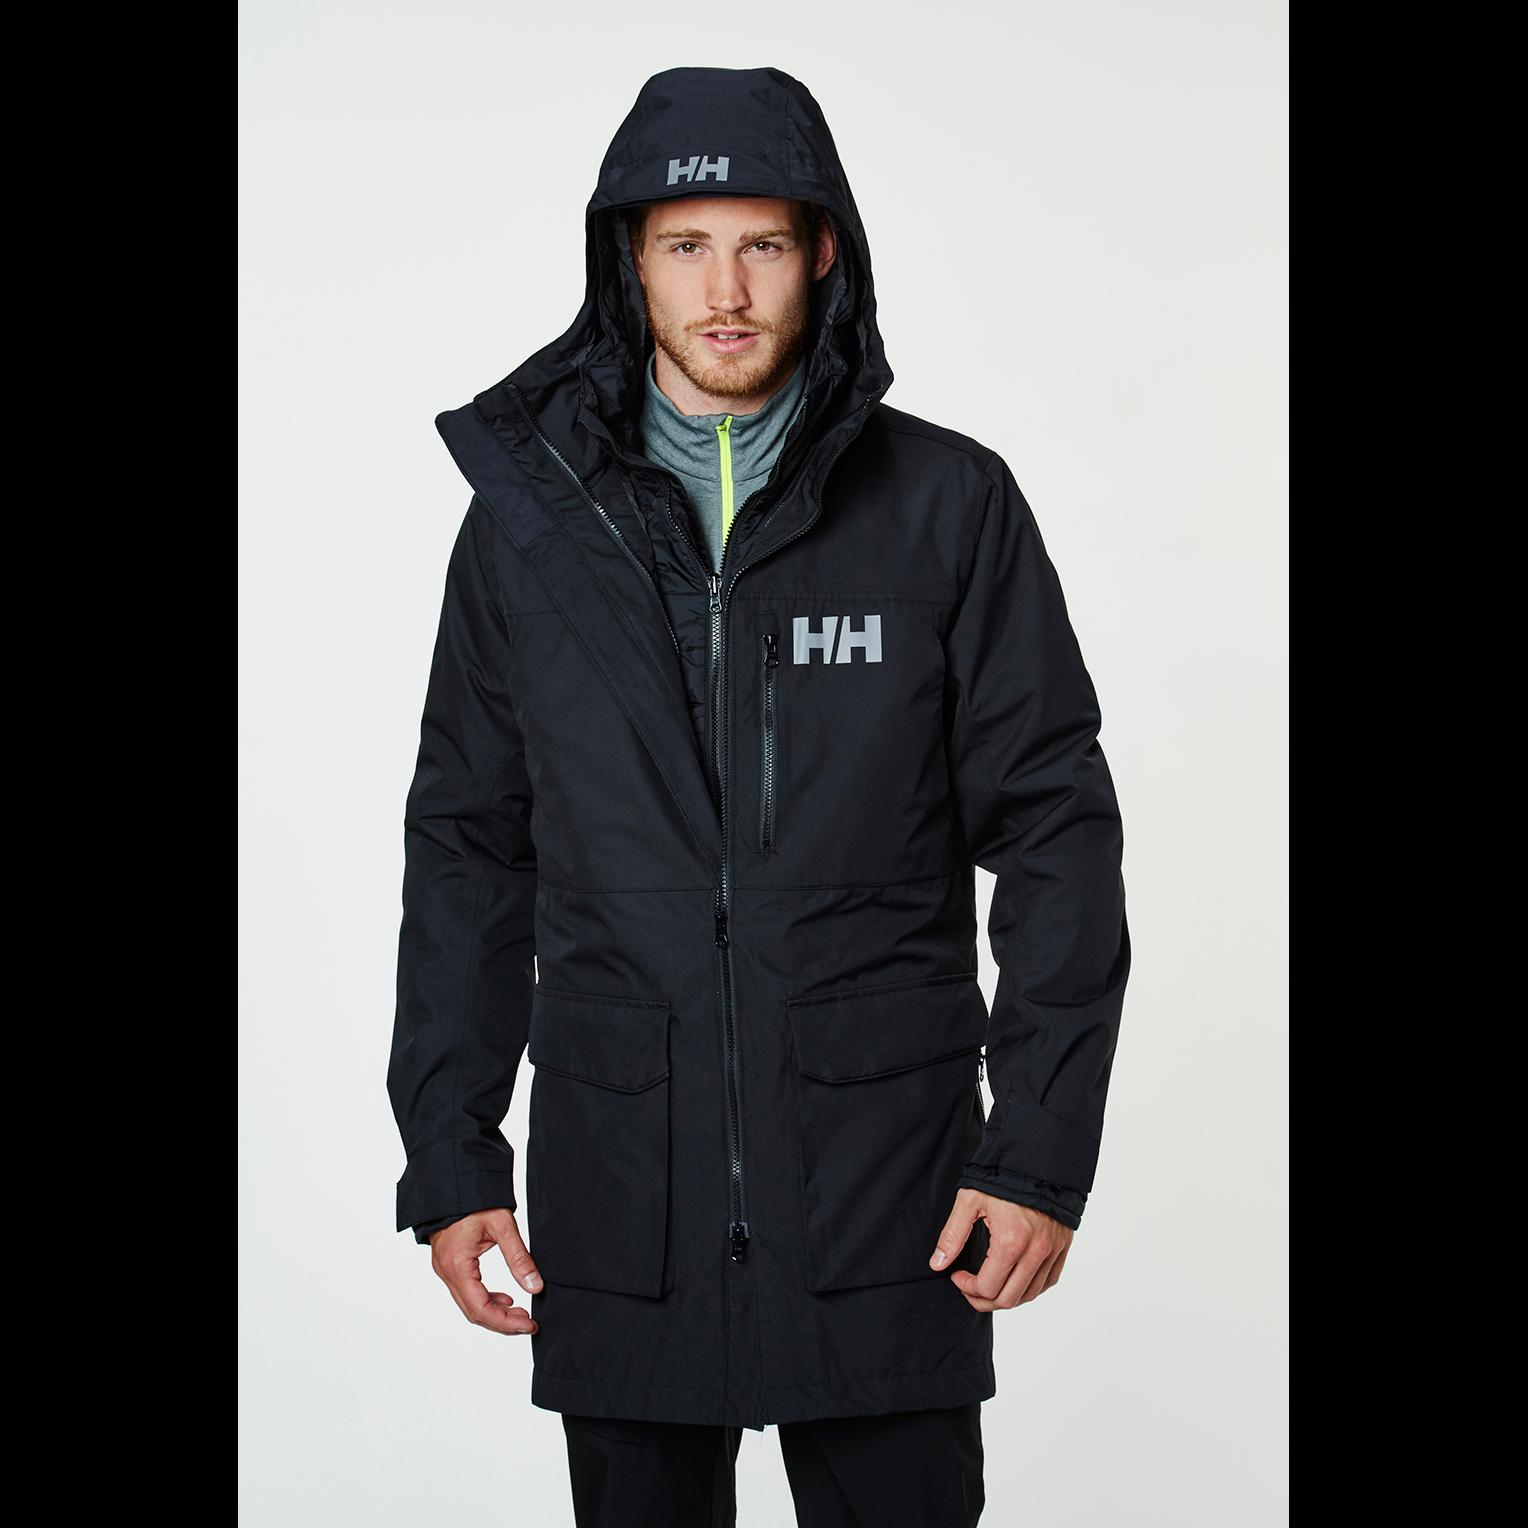 32b4e89068 RIGGING COAT - Men - Jackets - Helly Hansen Official Online Store ...